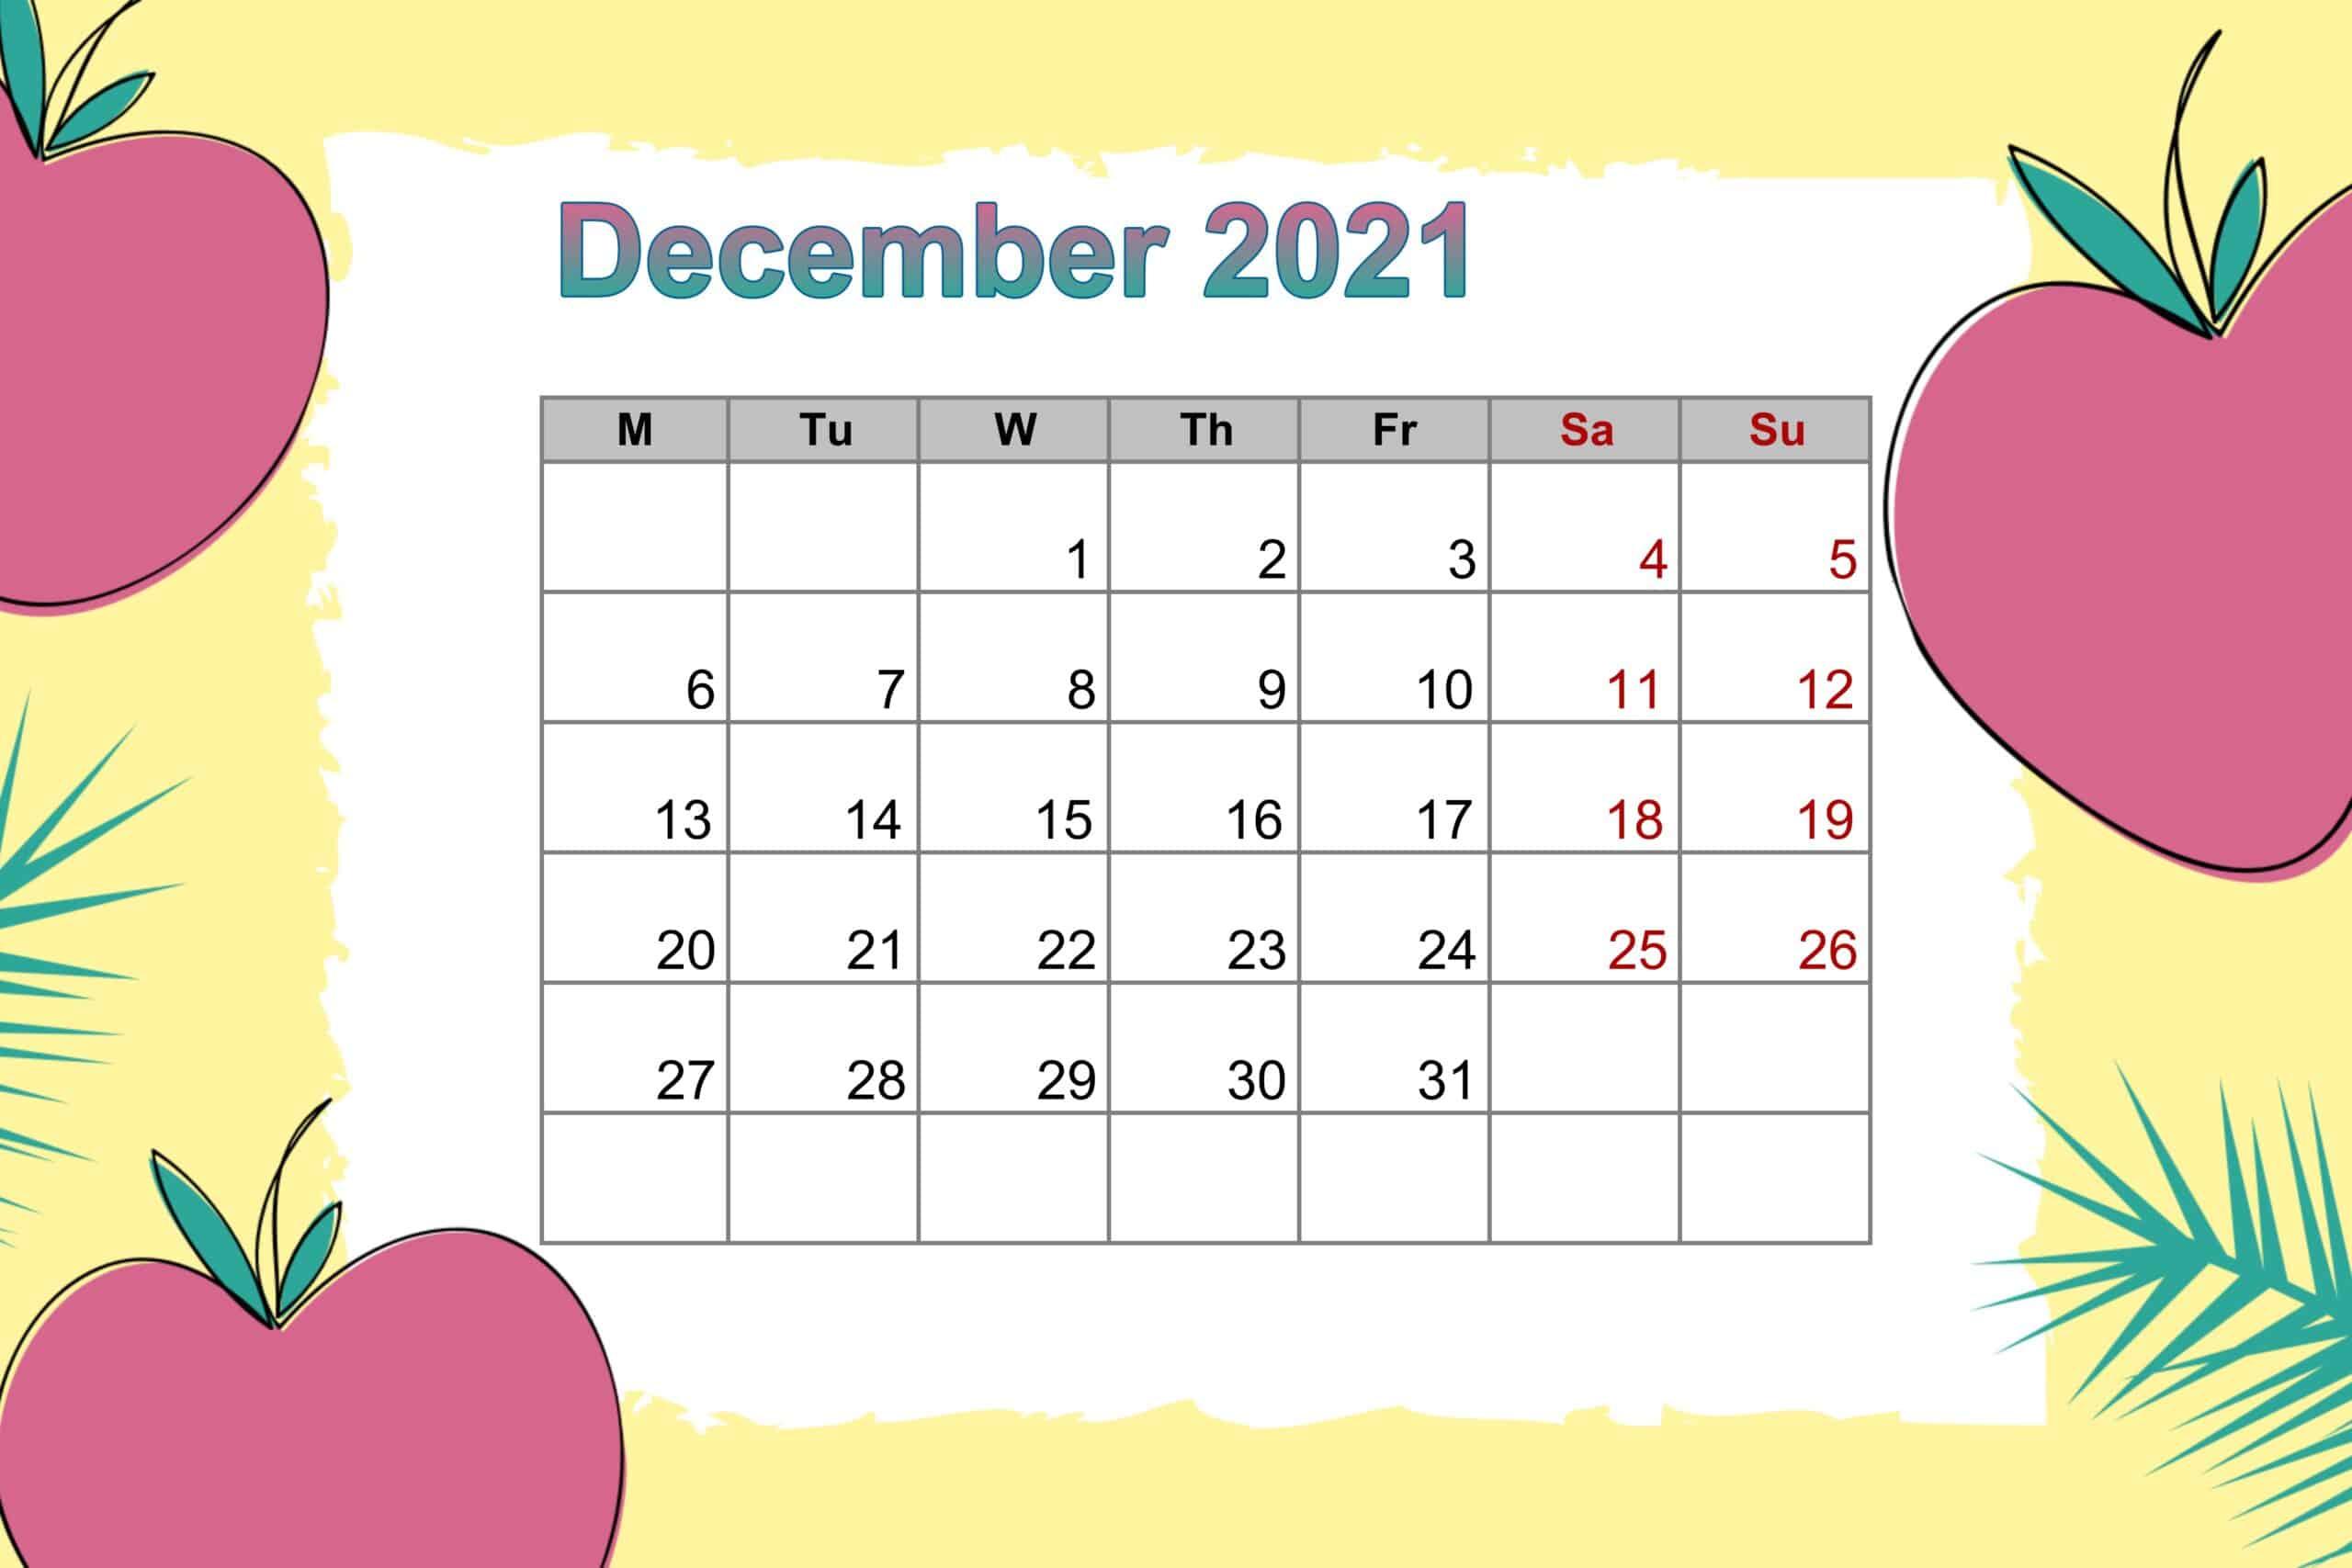 December 2021 Floral Calendar